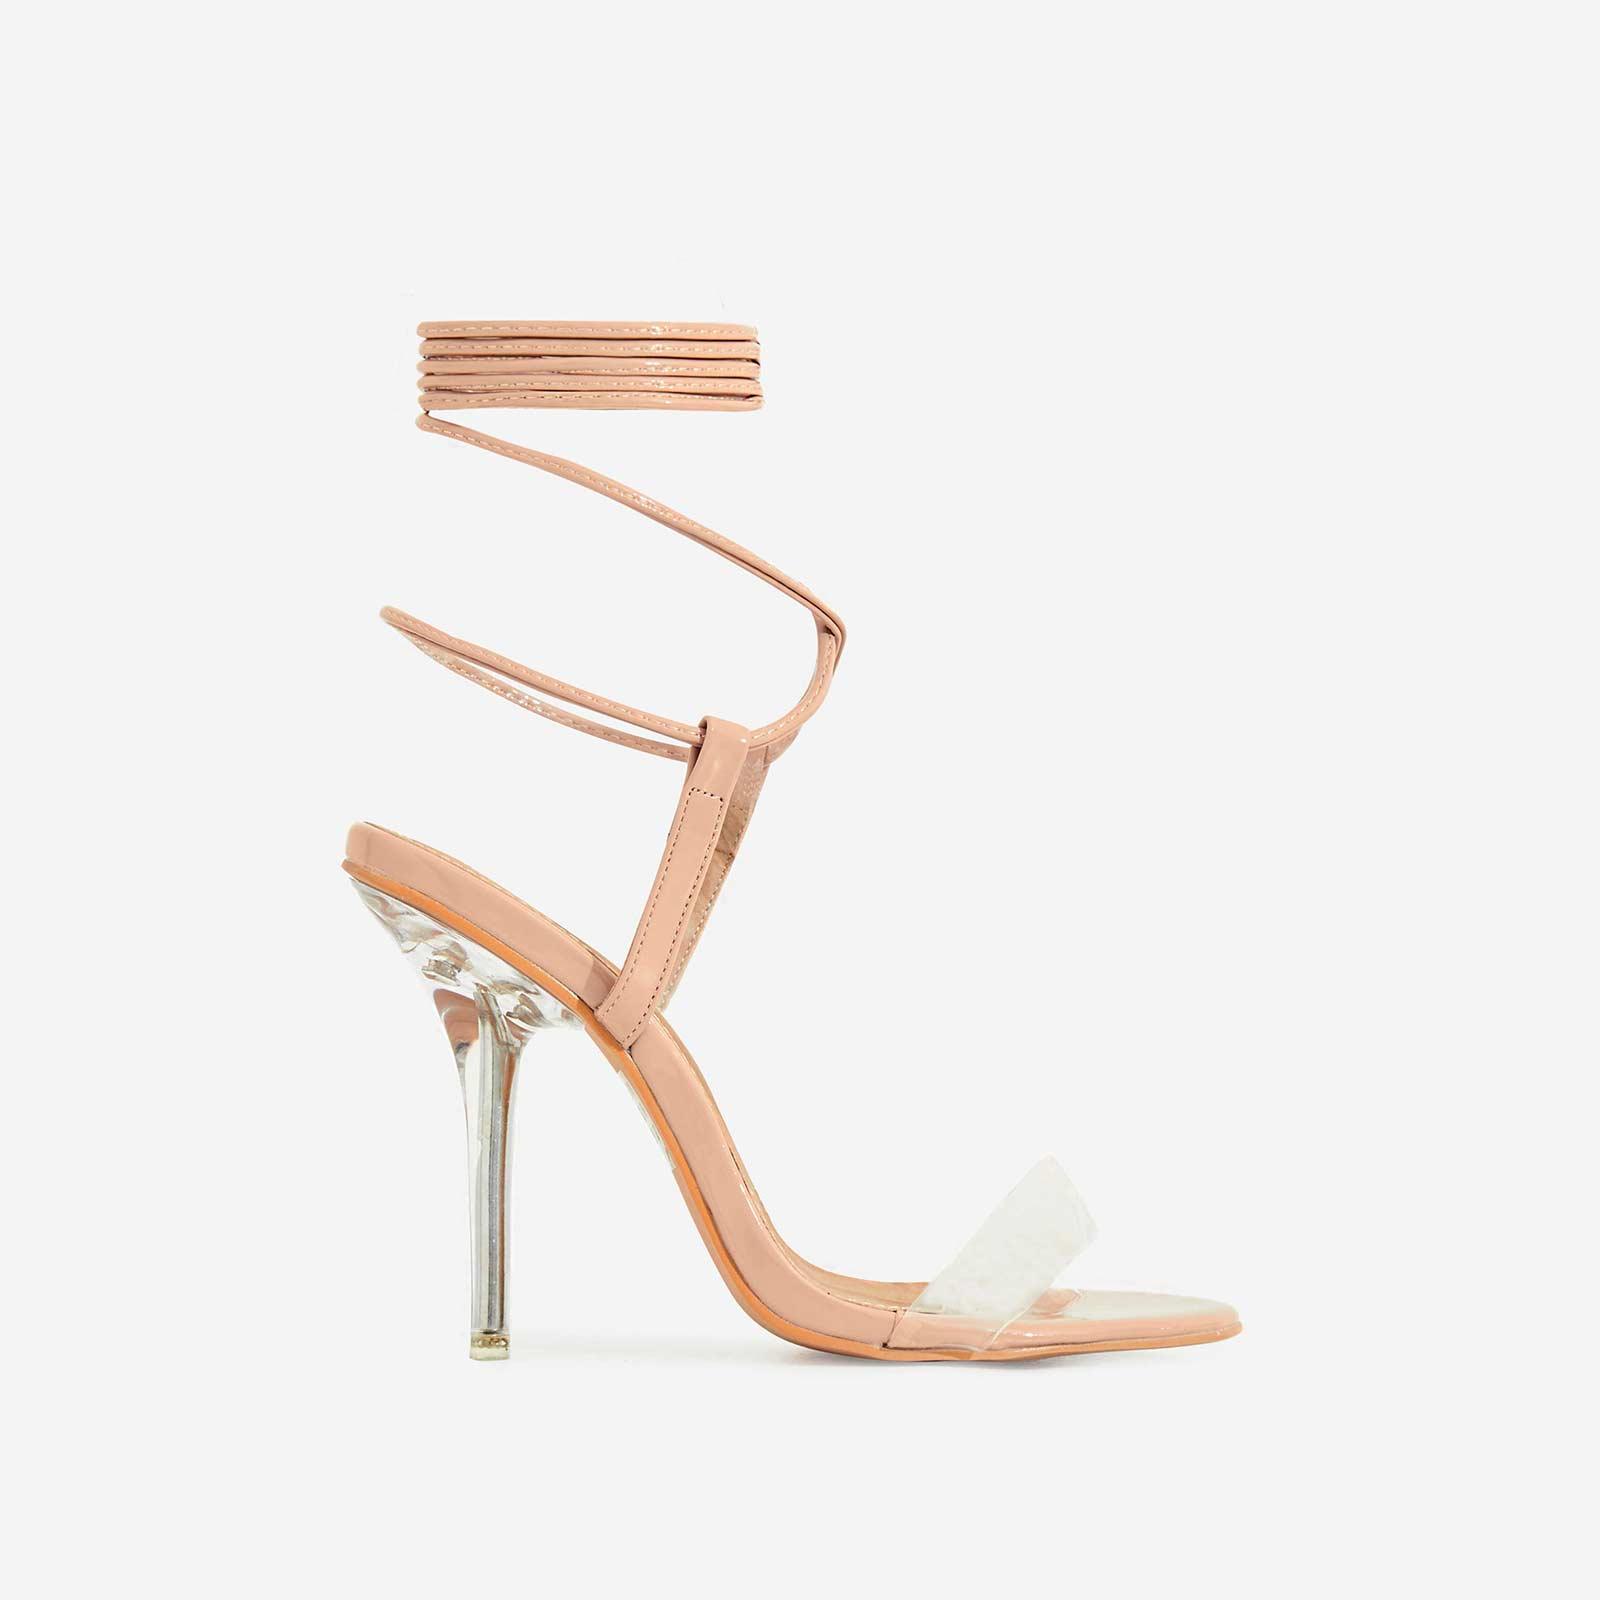 0e3e5367fc080 Women's Heeled Sandals & Party Heels | EGO Shoes